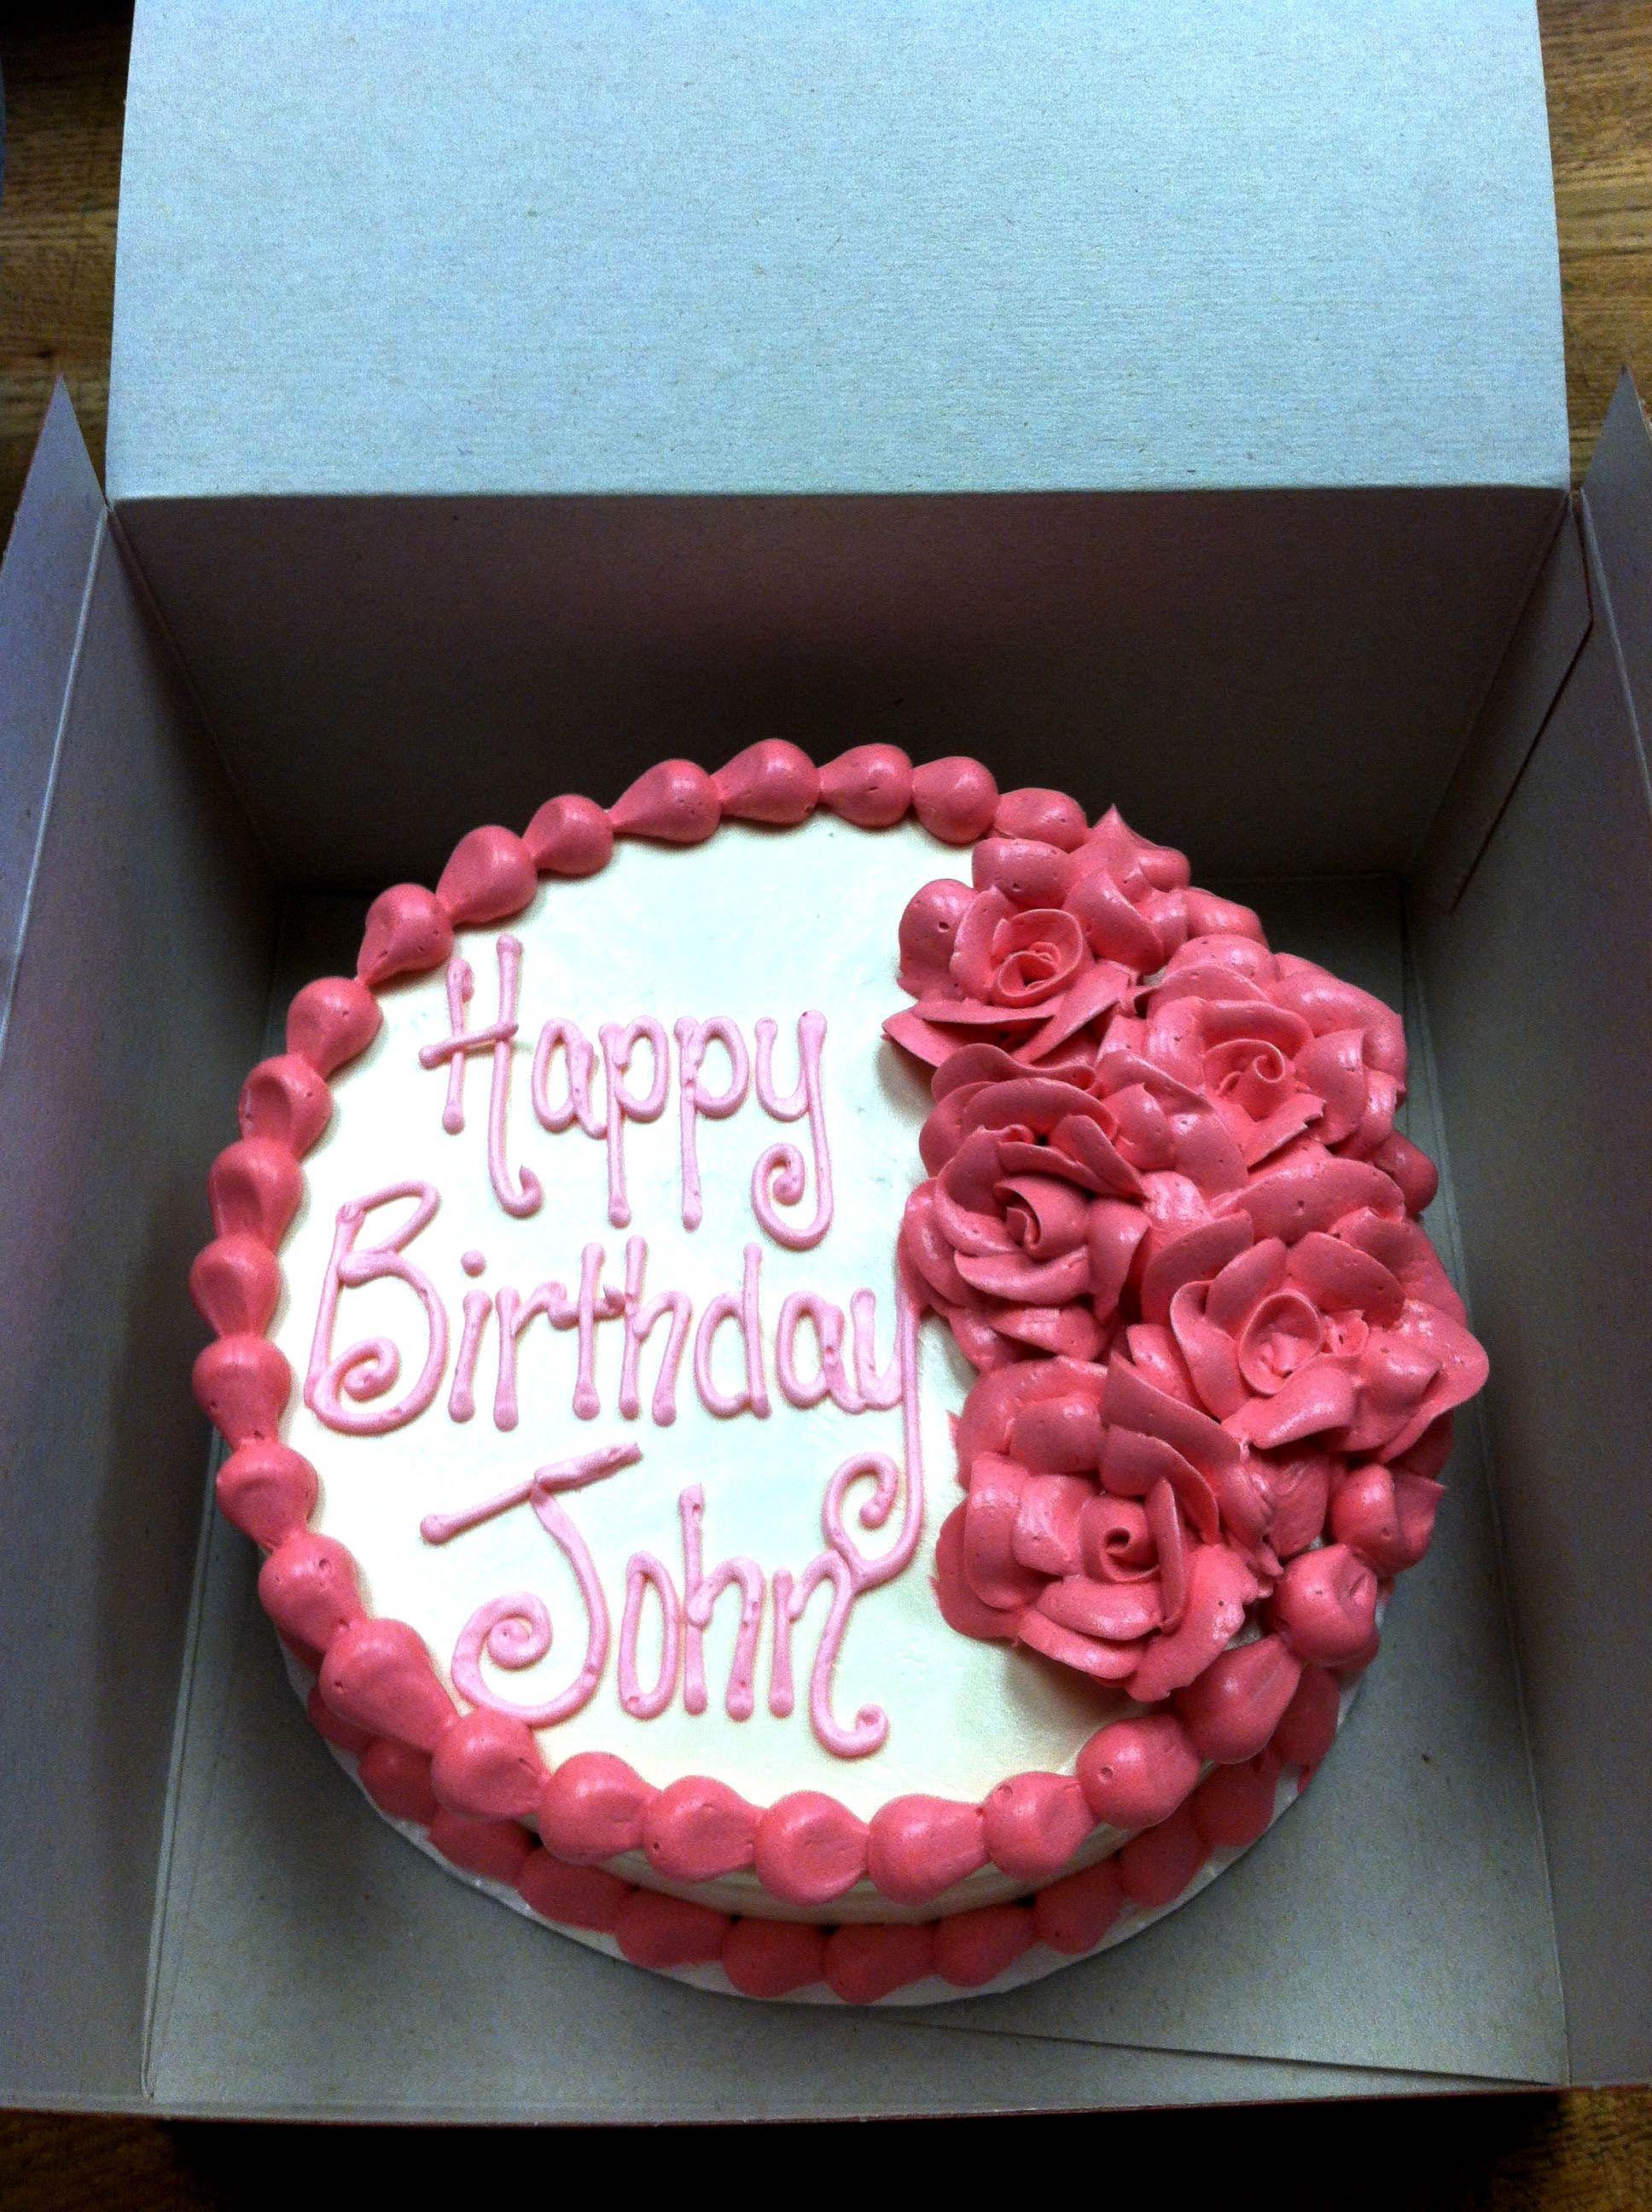 Surprising Happy Birthday John Happy Birthday John Cake Cake Desserts Funny Birthday Cards Online Kookostrdamsfinfo